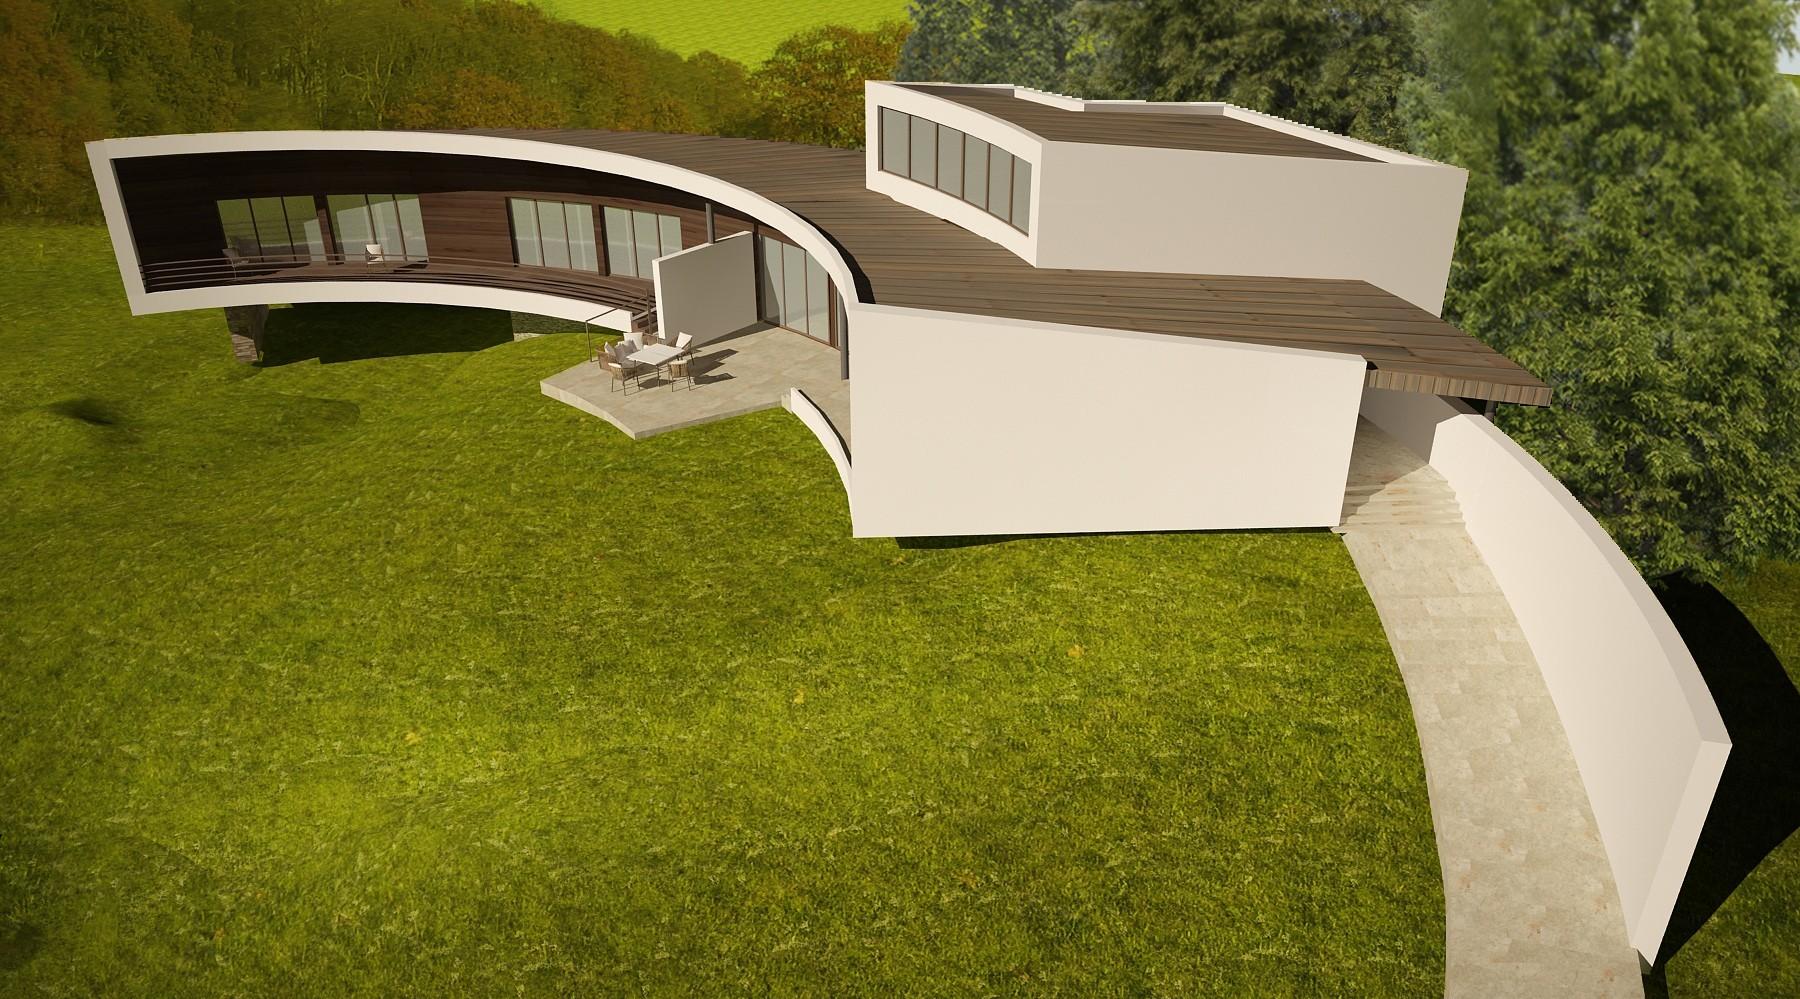 https://nbc-arhitect.ro/wp-content/uploads/2020/10/NBC-Arhitect-_-Breaza-House-_-Breaza-Romania-_-exterior-view_2.jpg